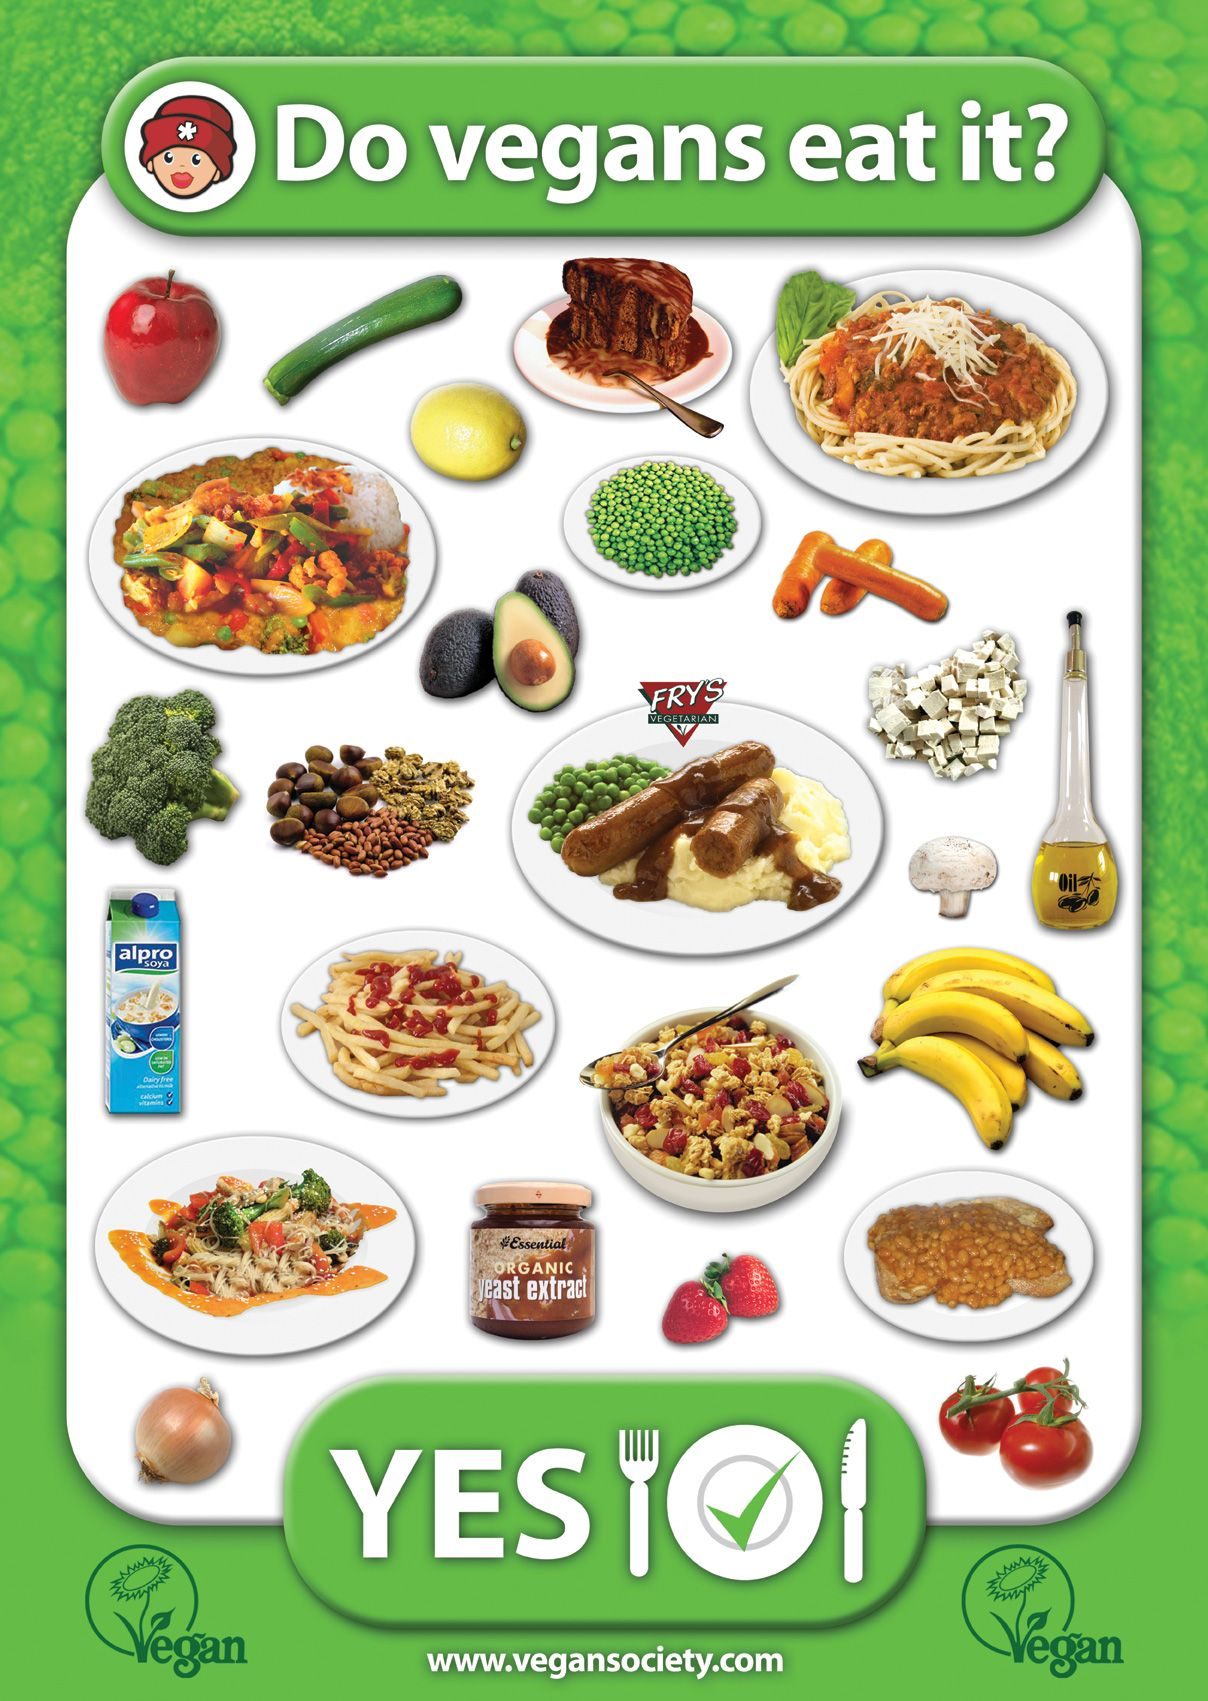 Vegan Society Poster Do Vegans Eat It Yes Vegan Facts